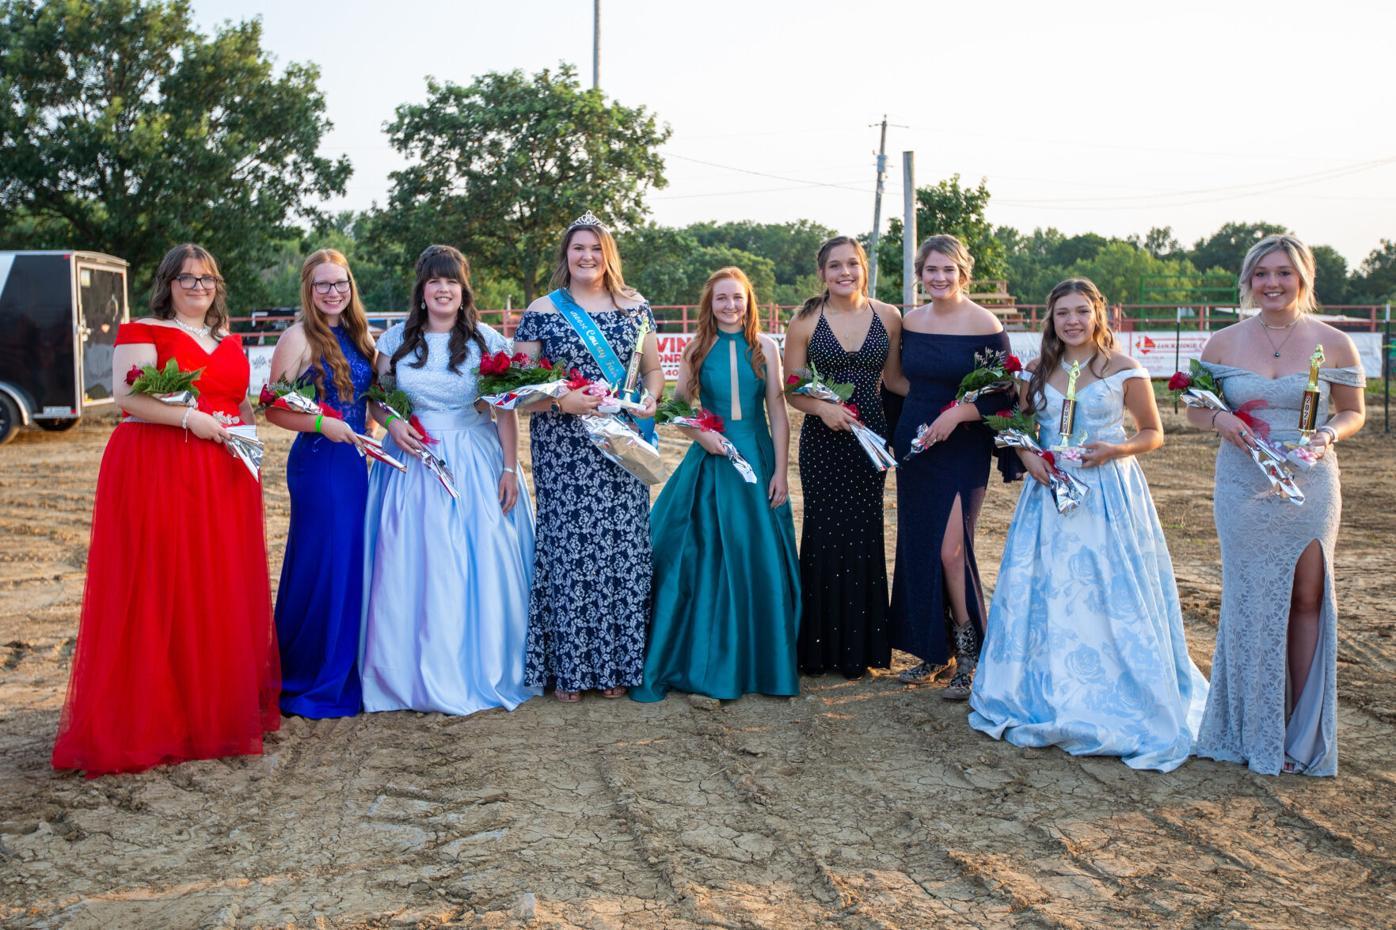 7-19 Appanoose County Fair Queens